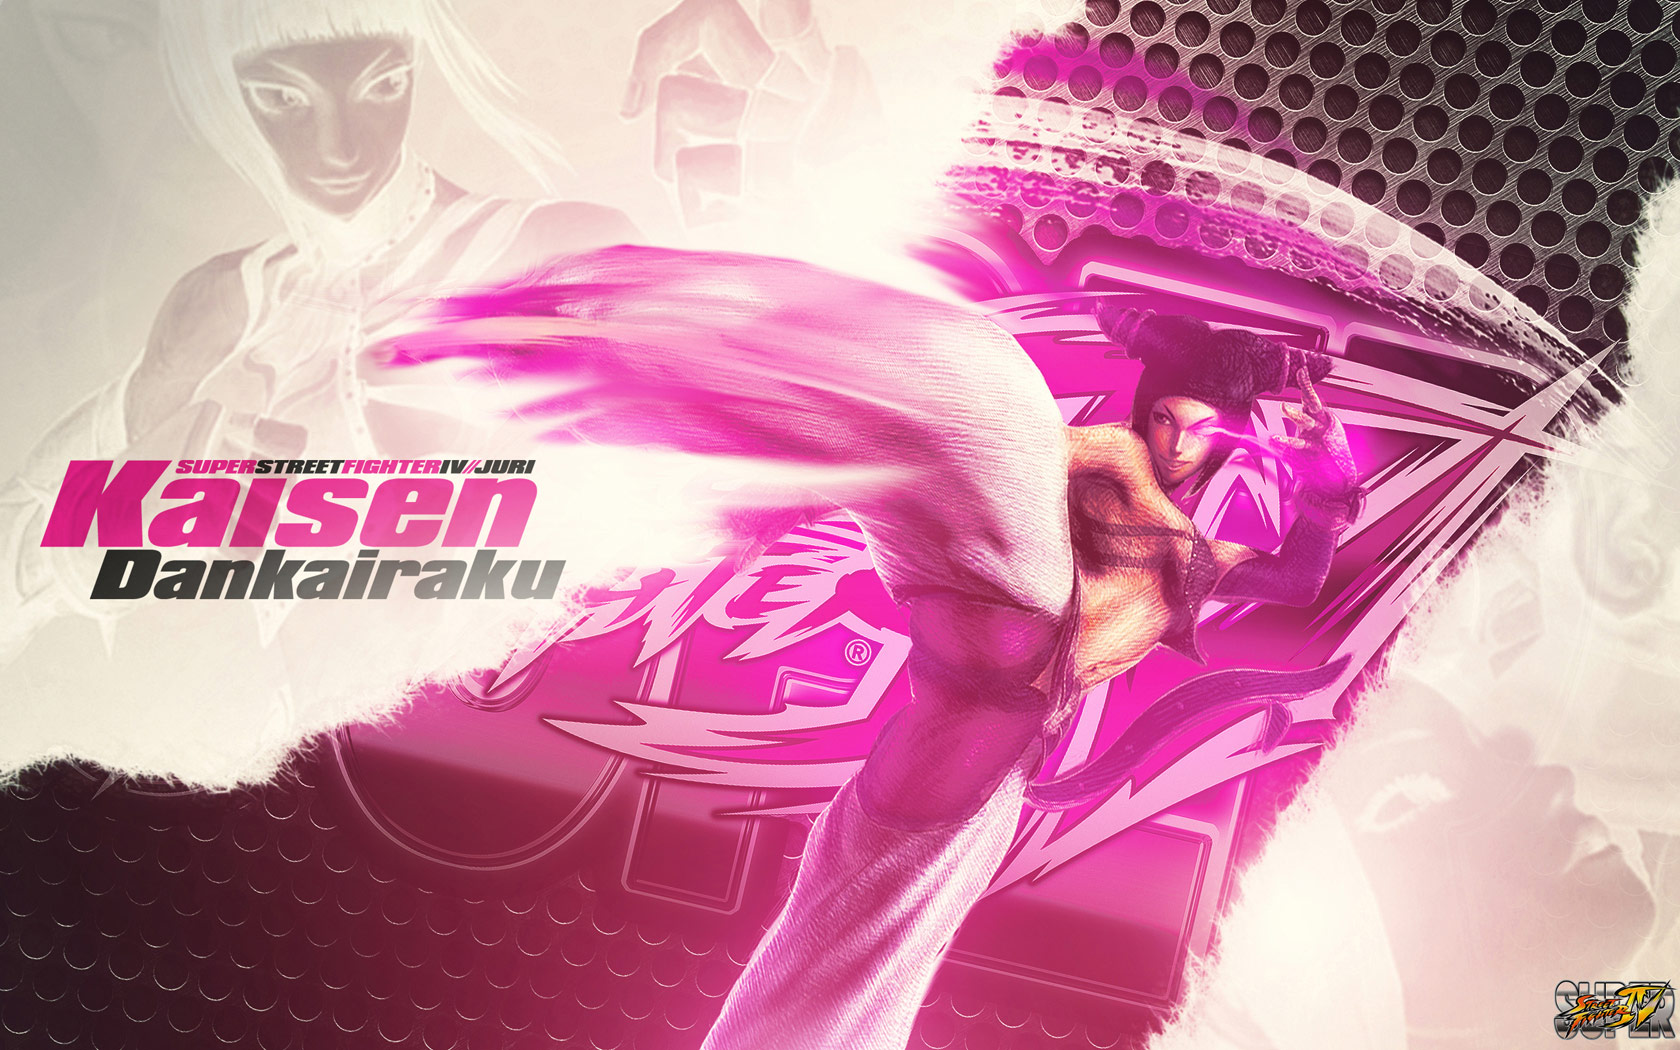 Juri Super Street Fighter 4 wallpaper by BossLogic